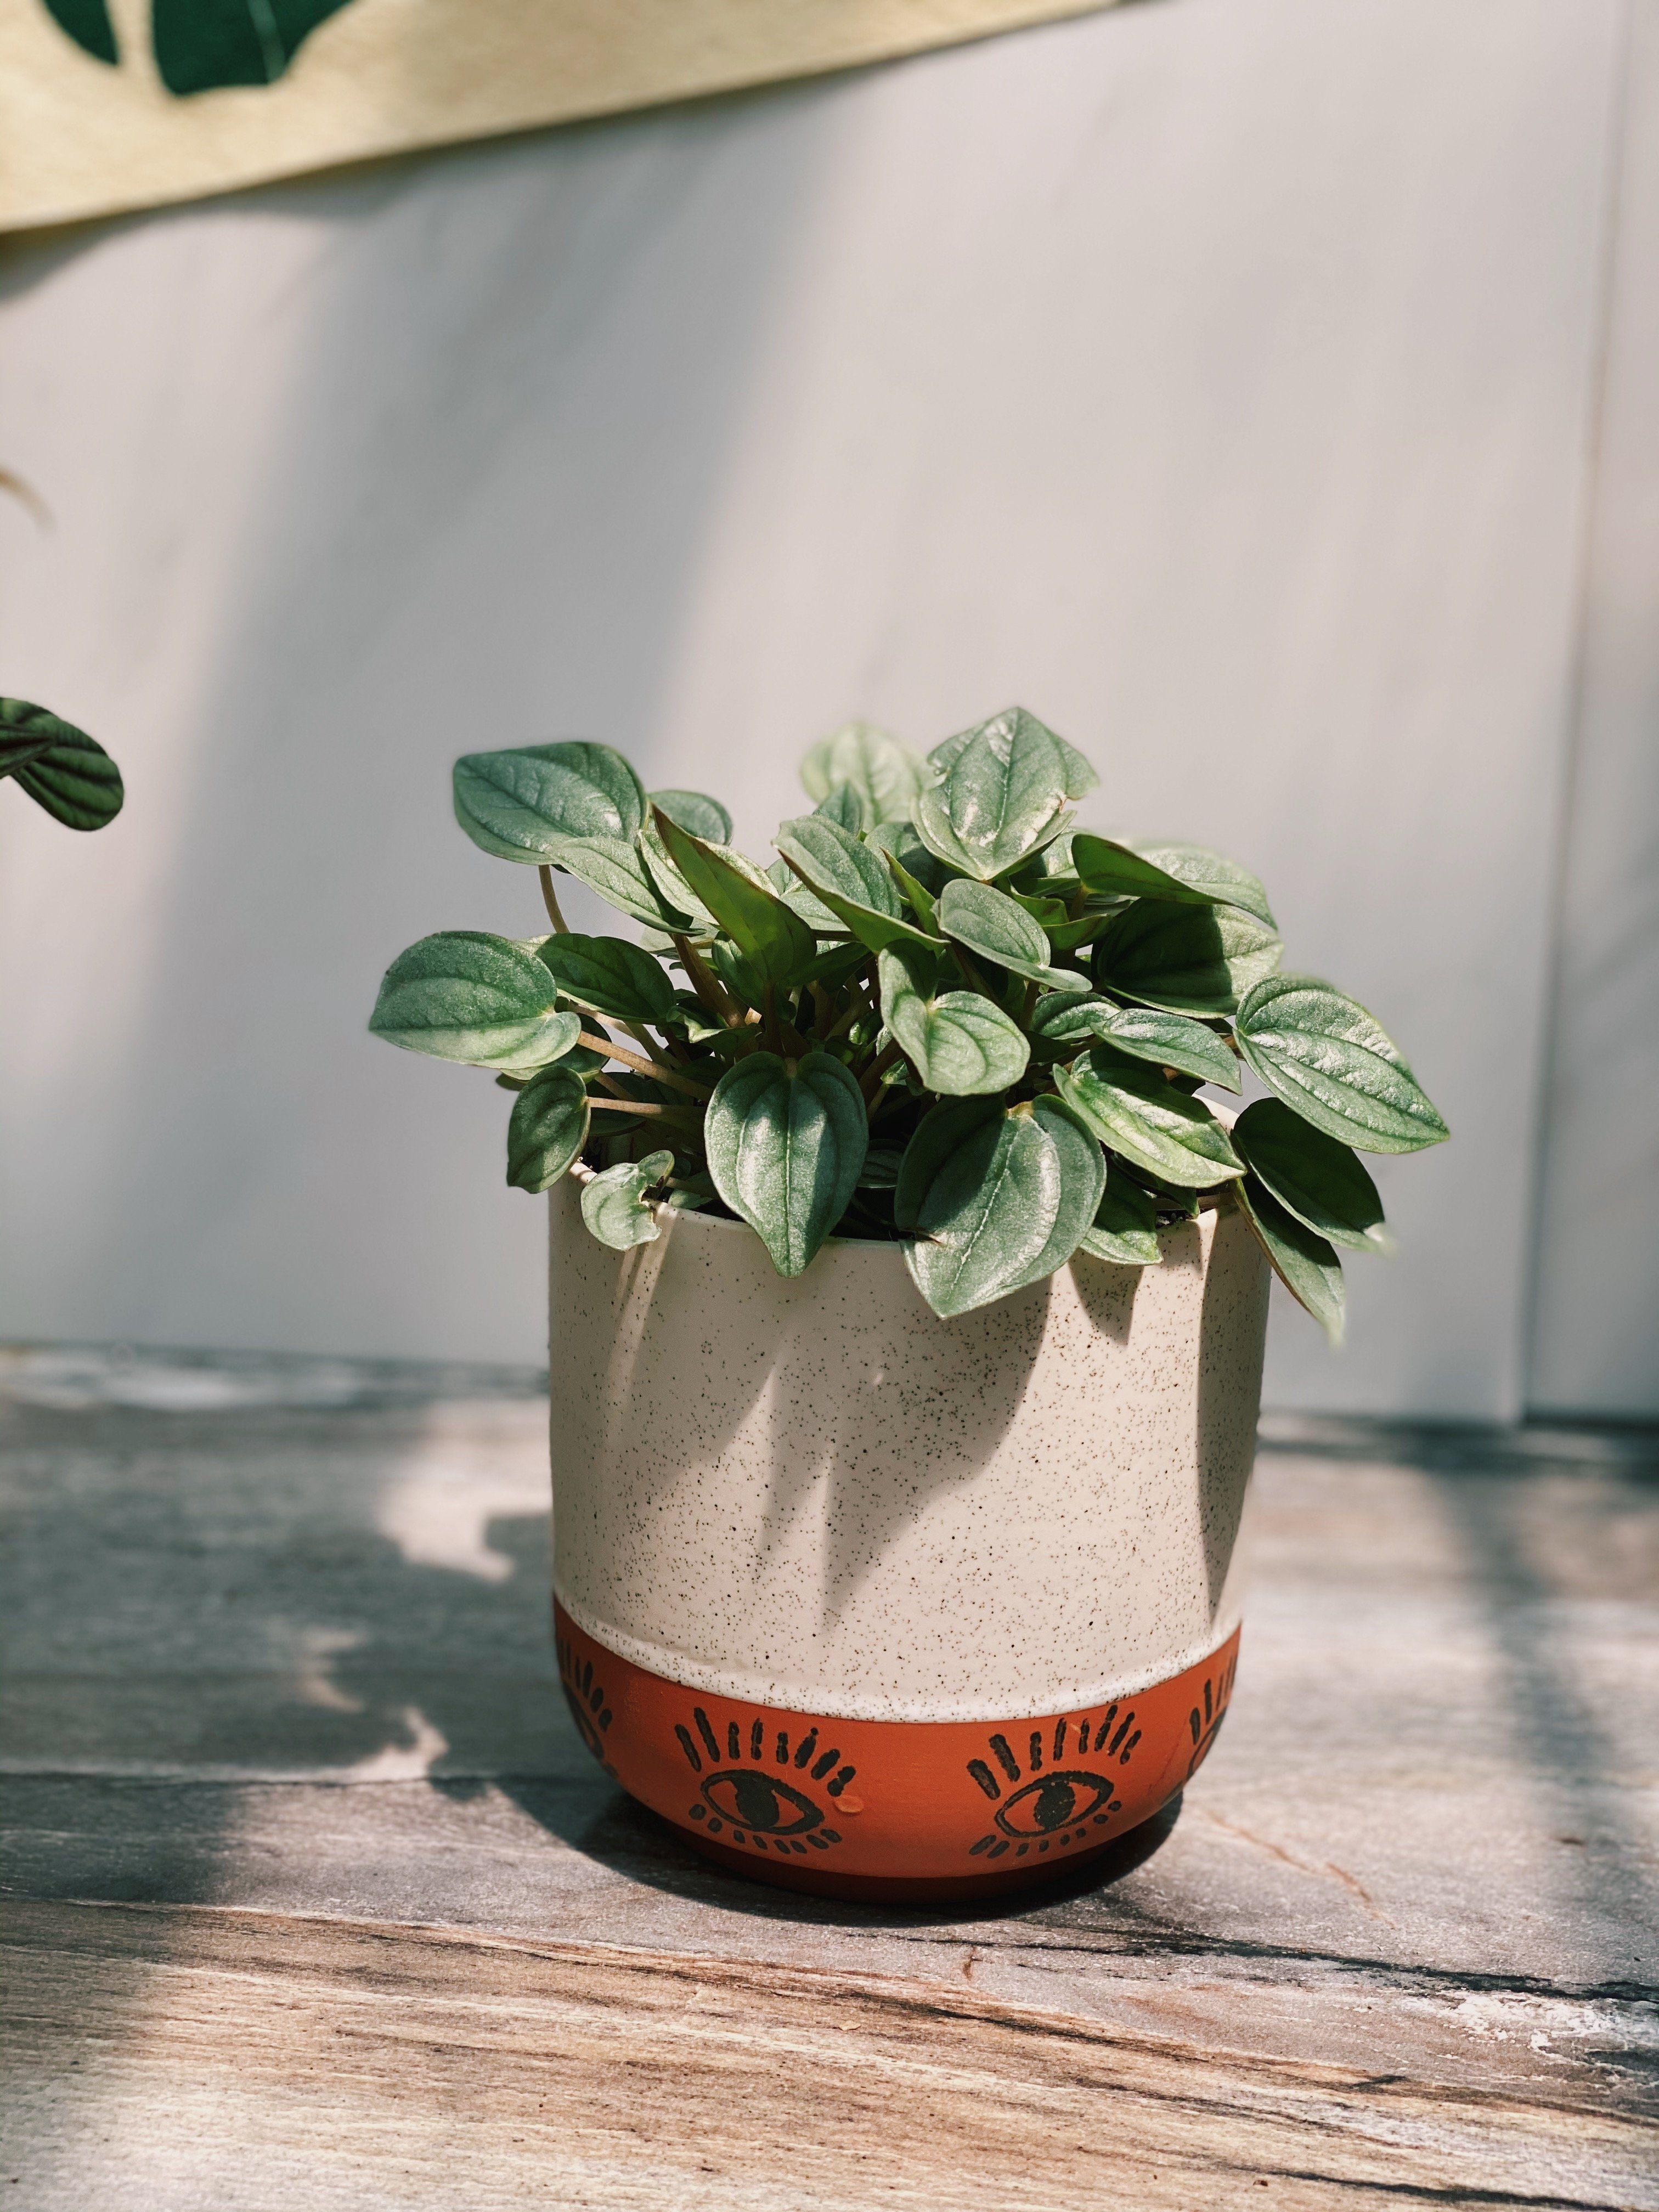 Seeing Eye Napoli Peperomia In 2020 Peperomia Garden Pots Plants